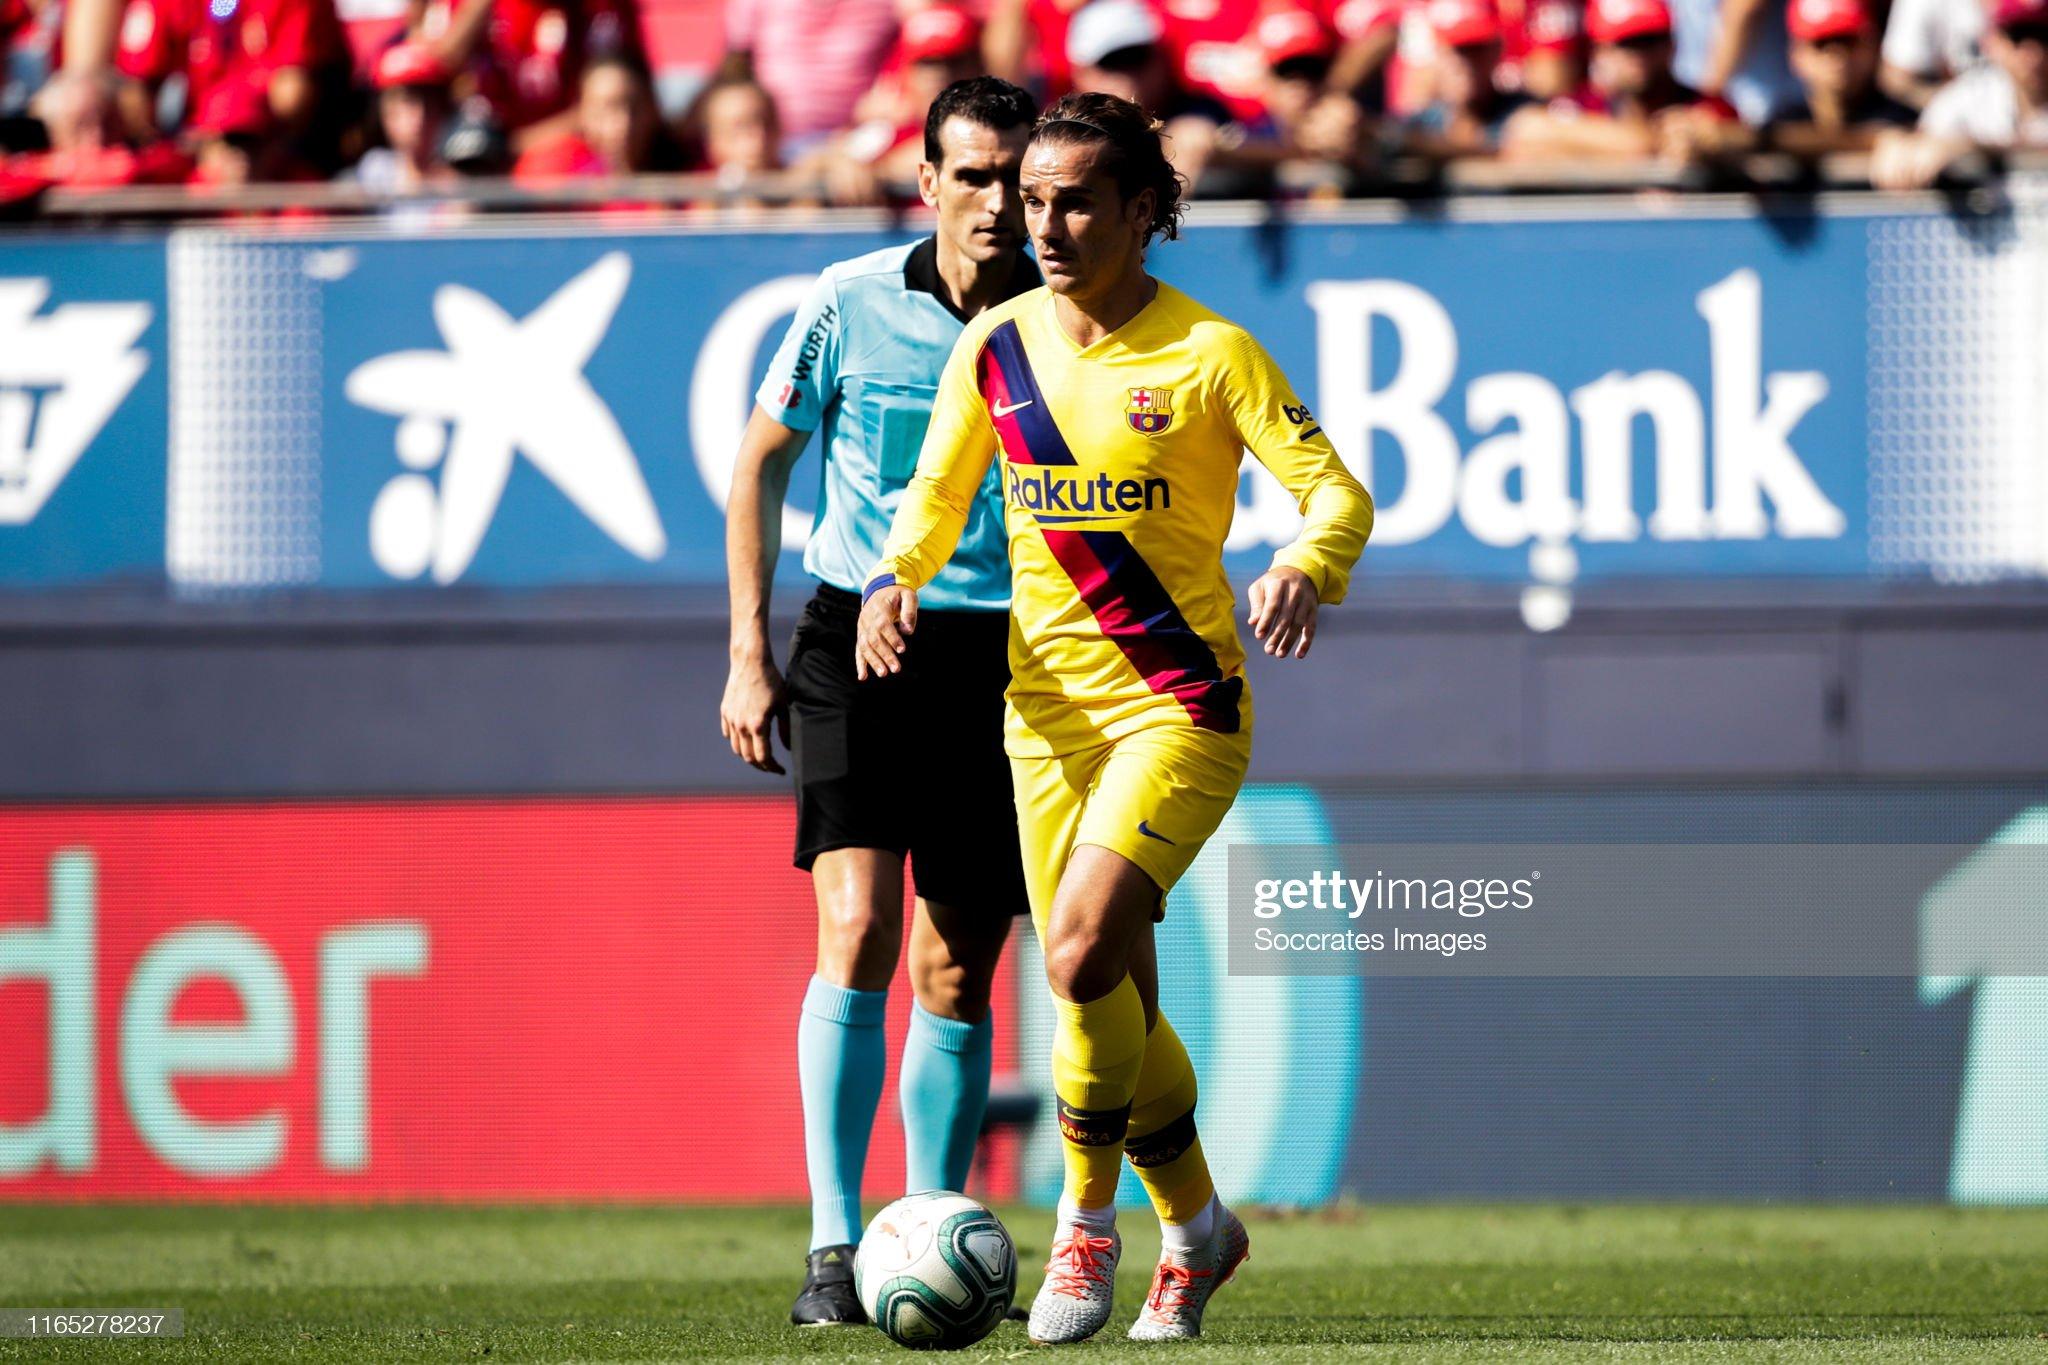 صور مباراة : أوساسونا - برشلونة 2-2 ( 31-08-2019 )  Antoine-griezmann-of-fc-barcelona-during-the-la-liga-santander-match-picture-id1165278237?s=2048x2048